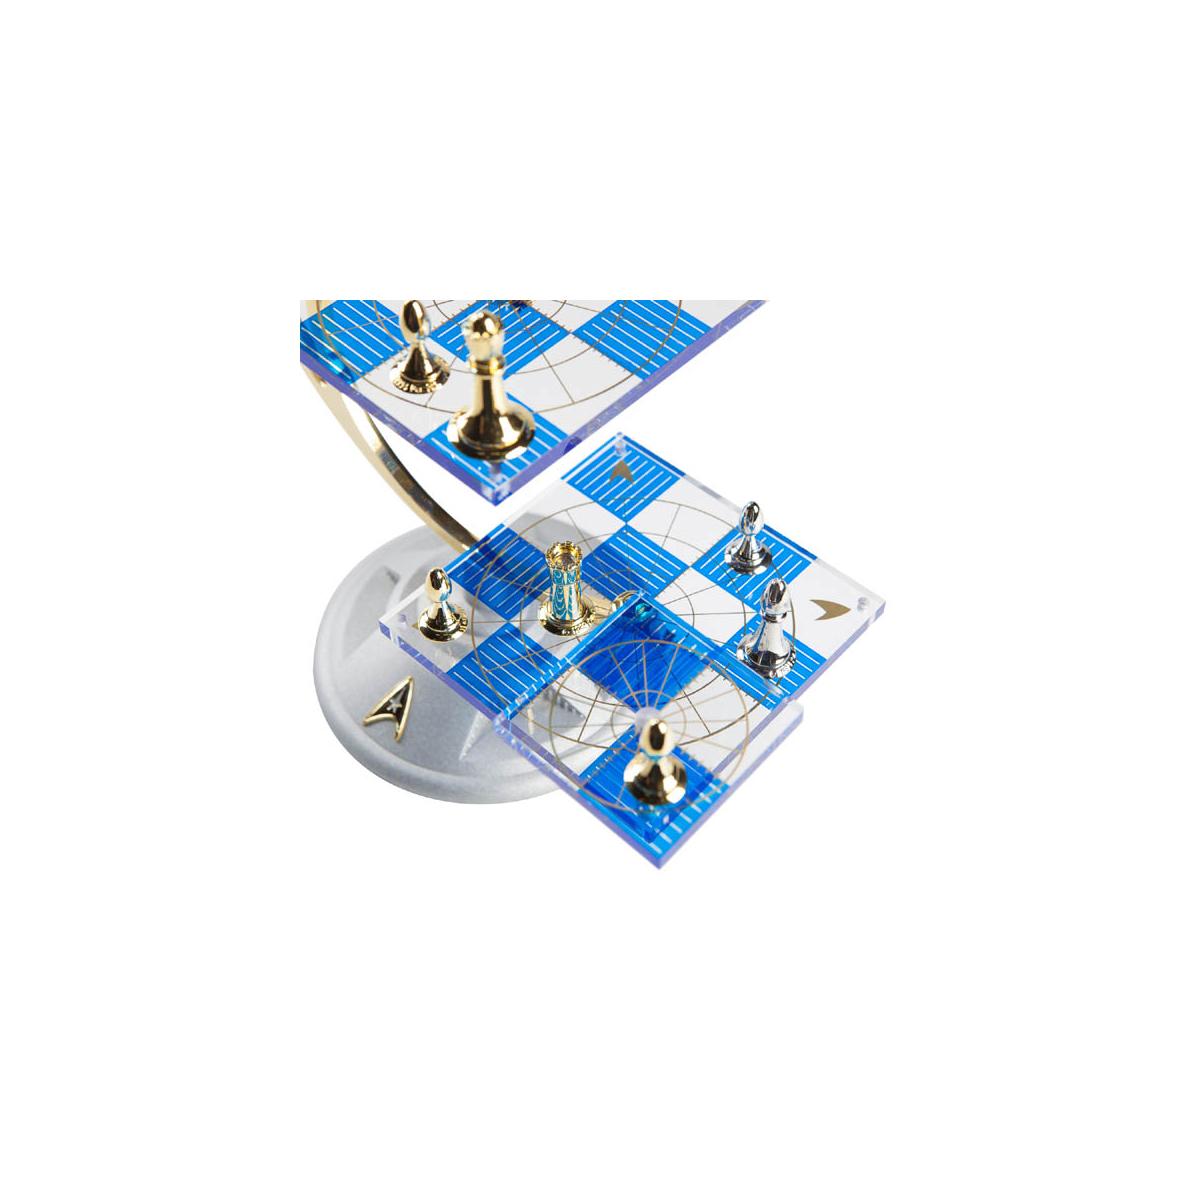 Star Trek Tridimensional Chess Set Shop The Star Trek